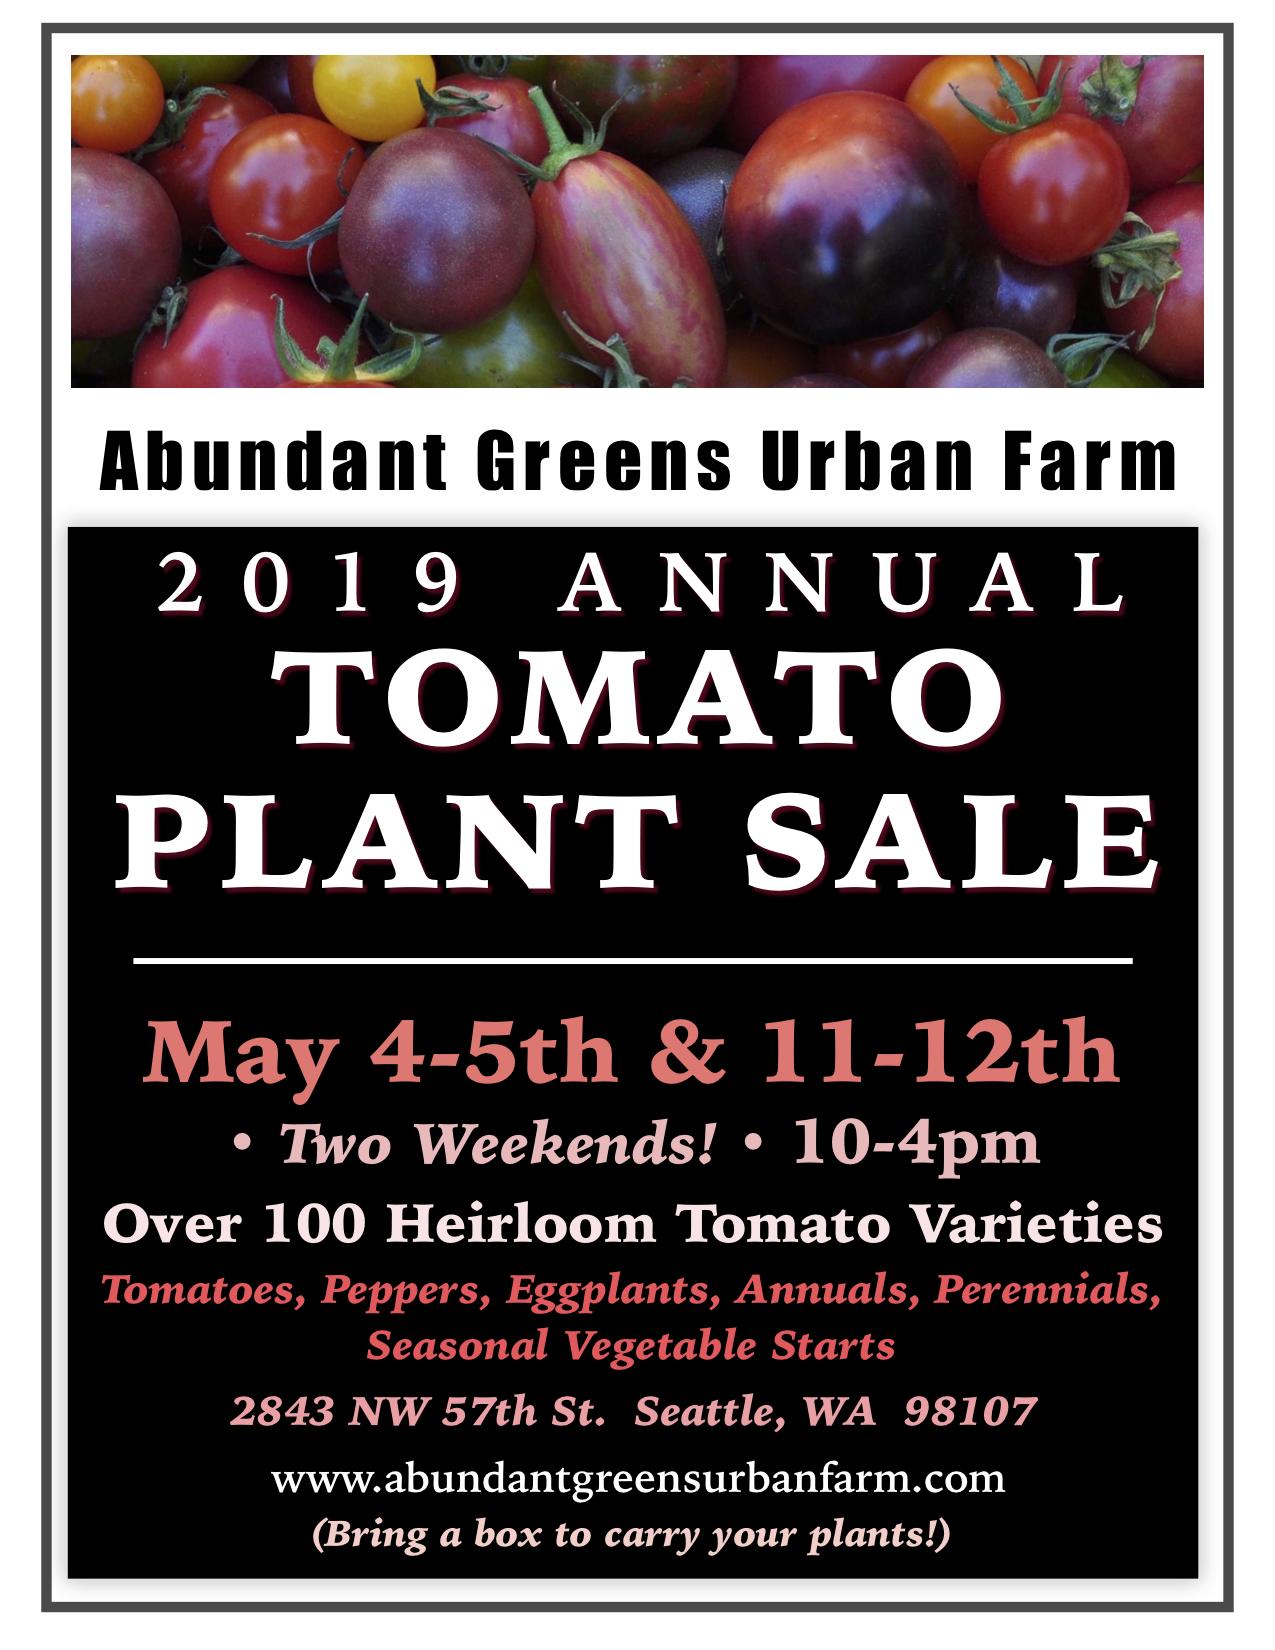 Abundant Greens Tomato Plant Sale